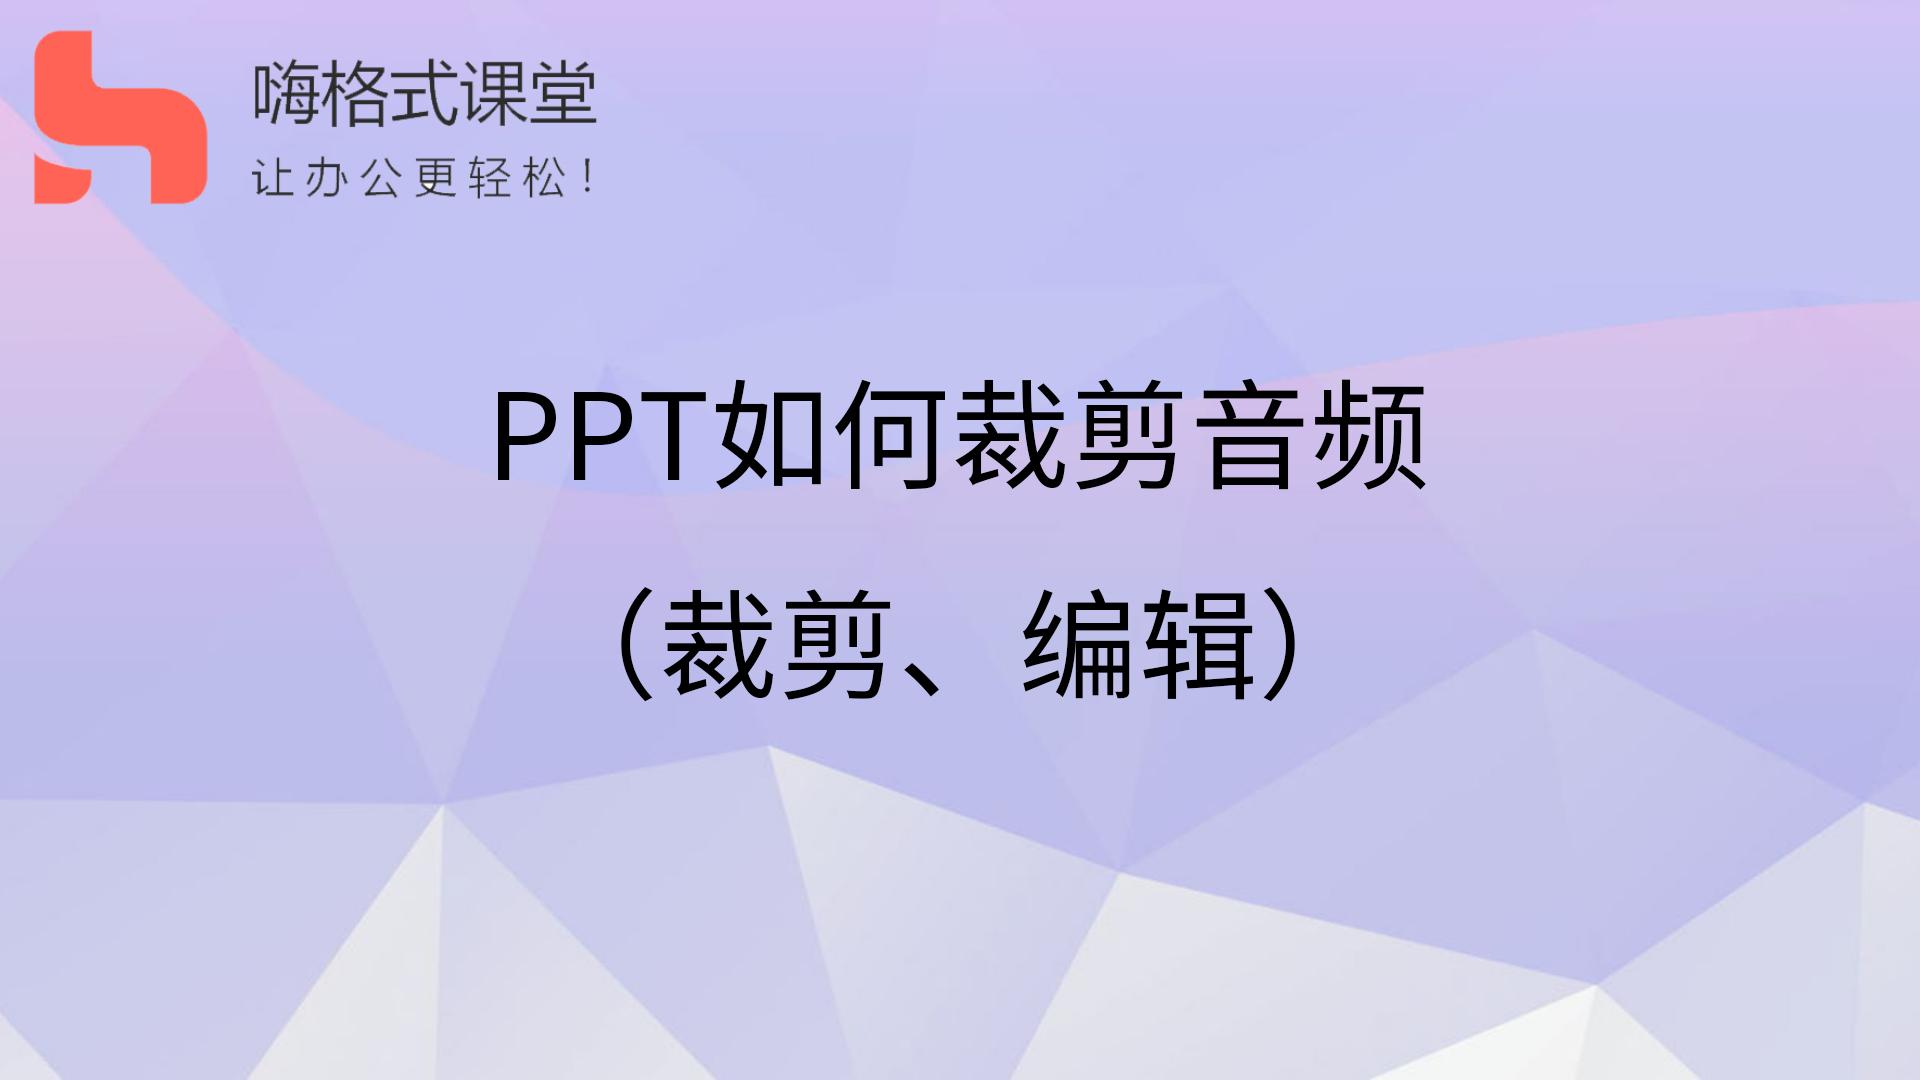 PPT如何裁剪音频(裁剪,编辑)